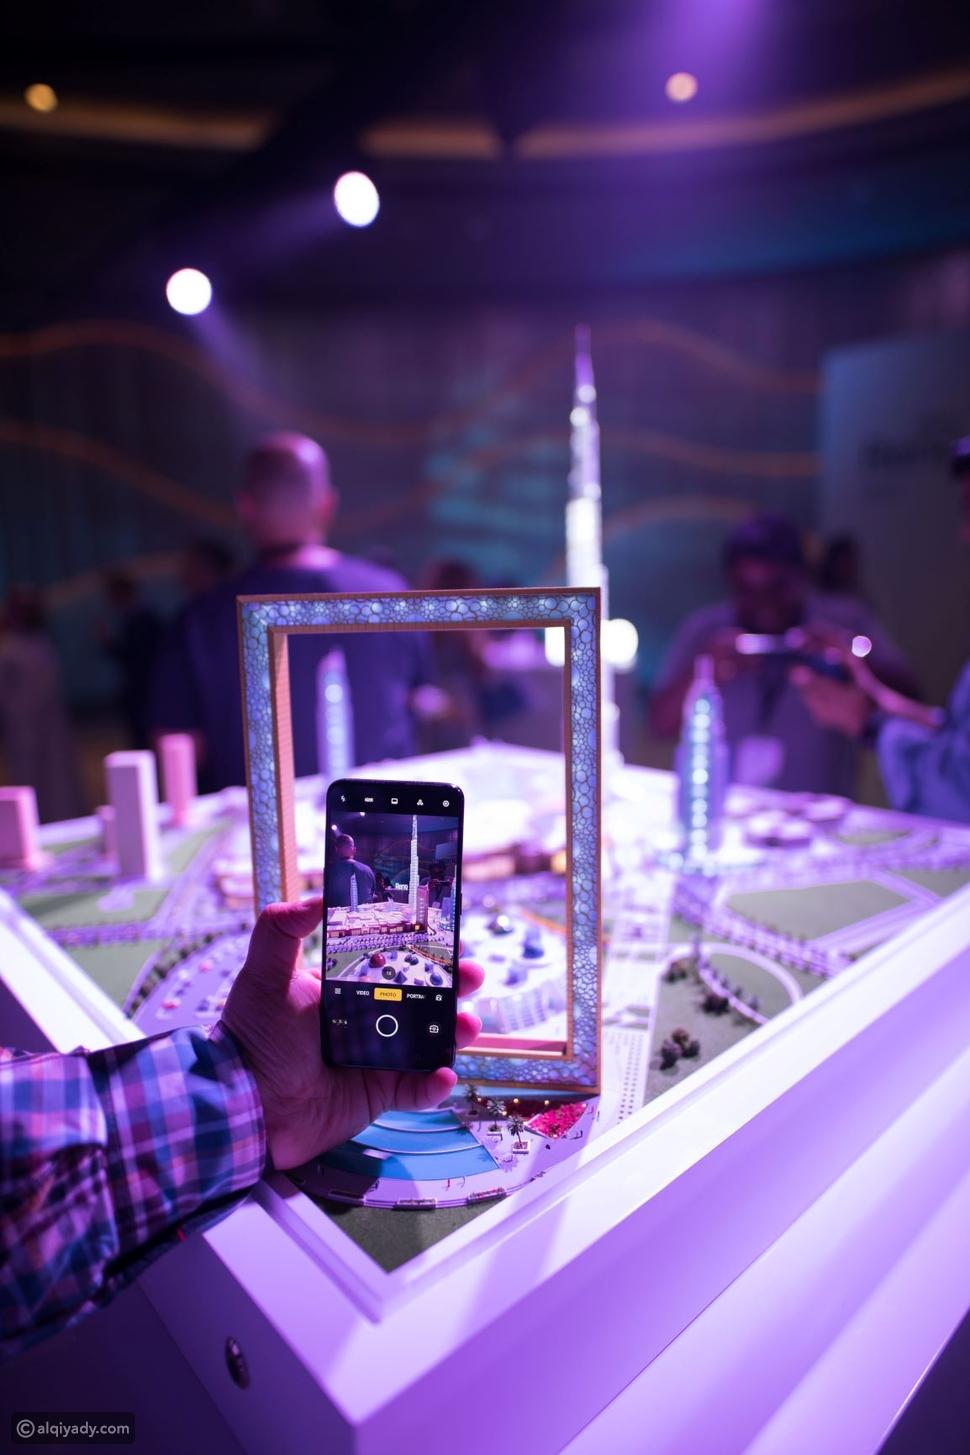 OPPO تحصد لقب أسرع علامة للهواتف الذكية المتميزة نمواً